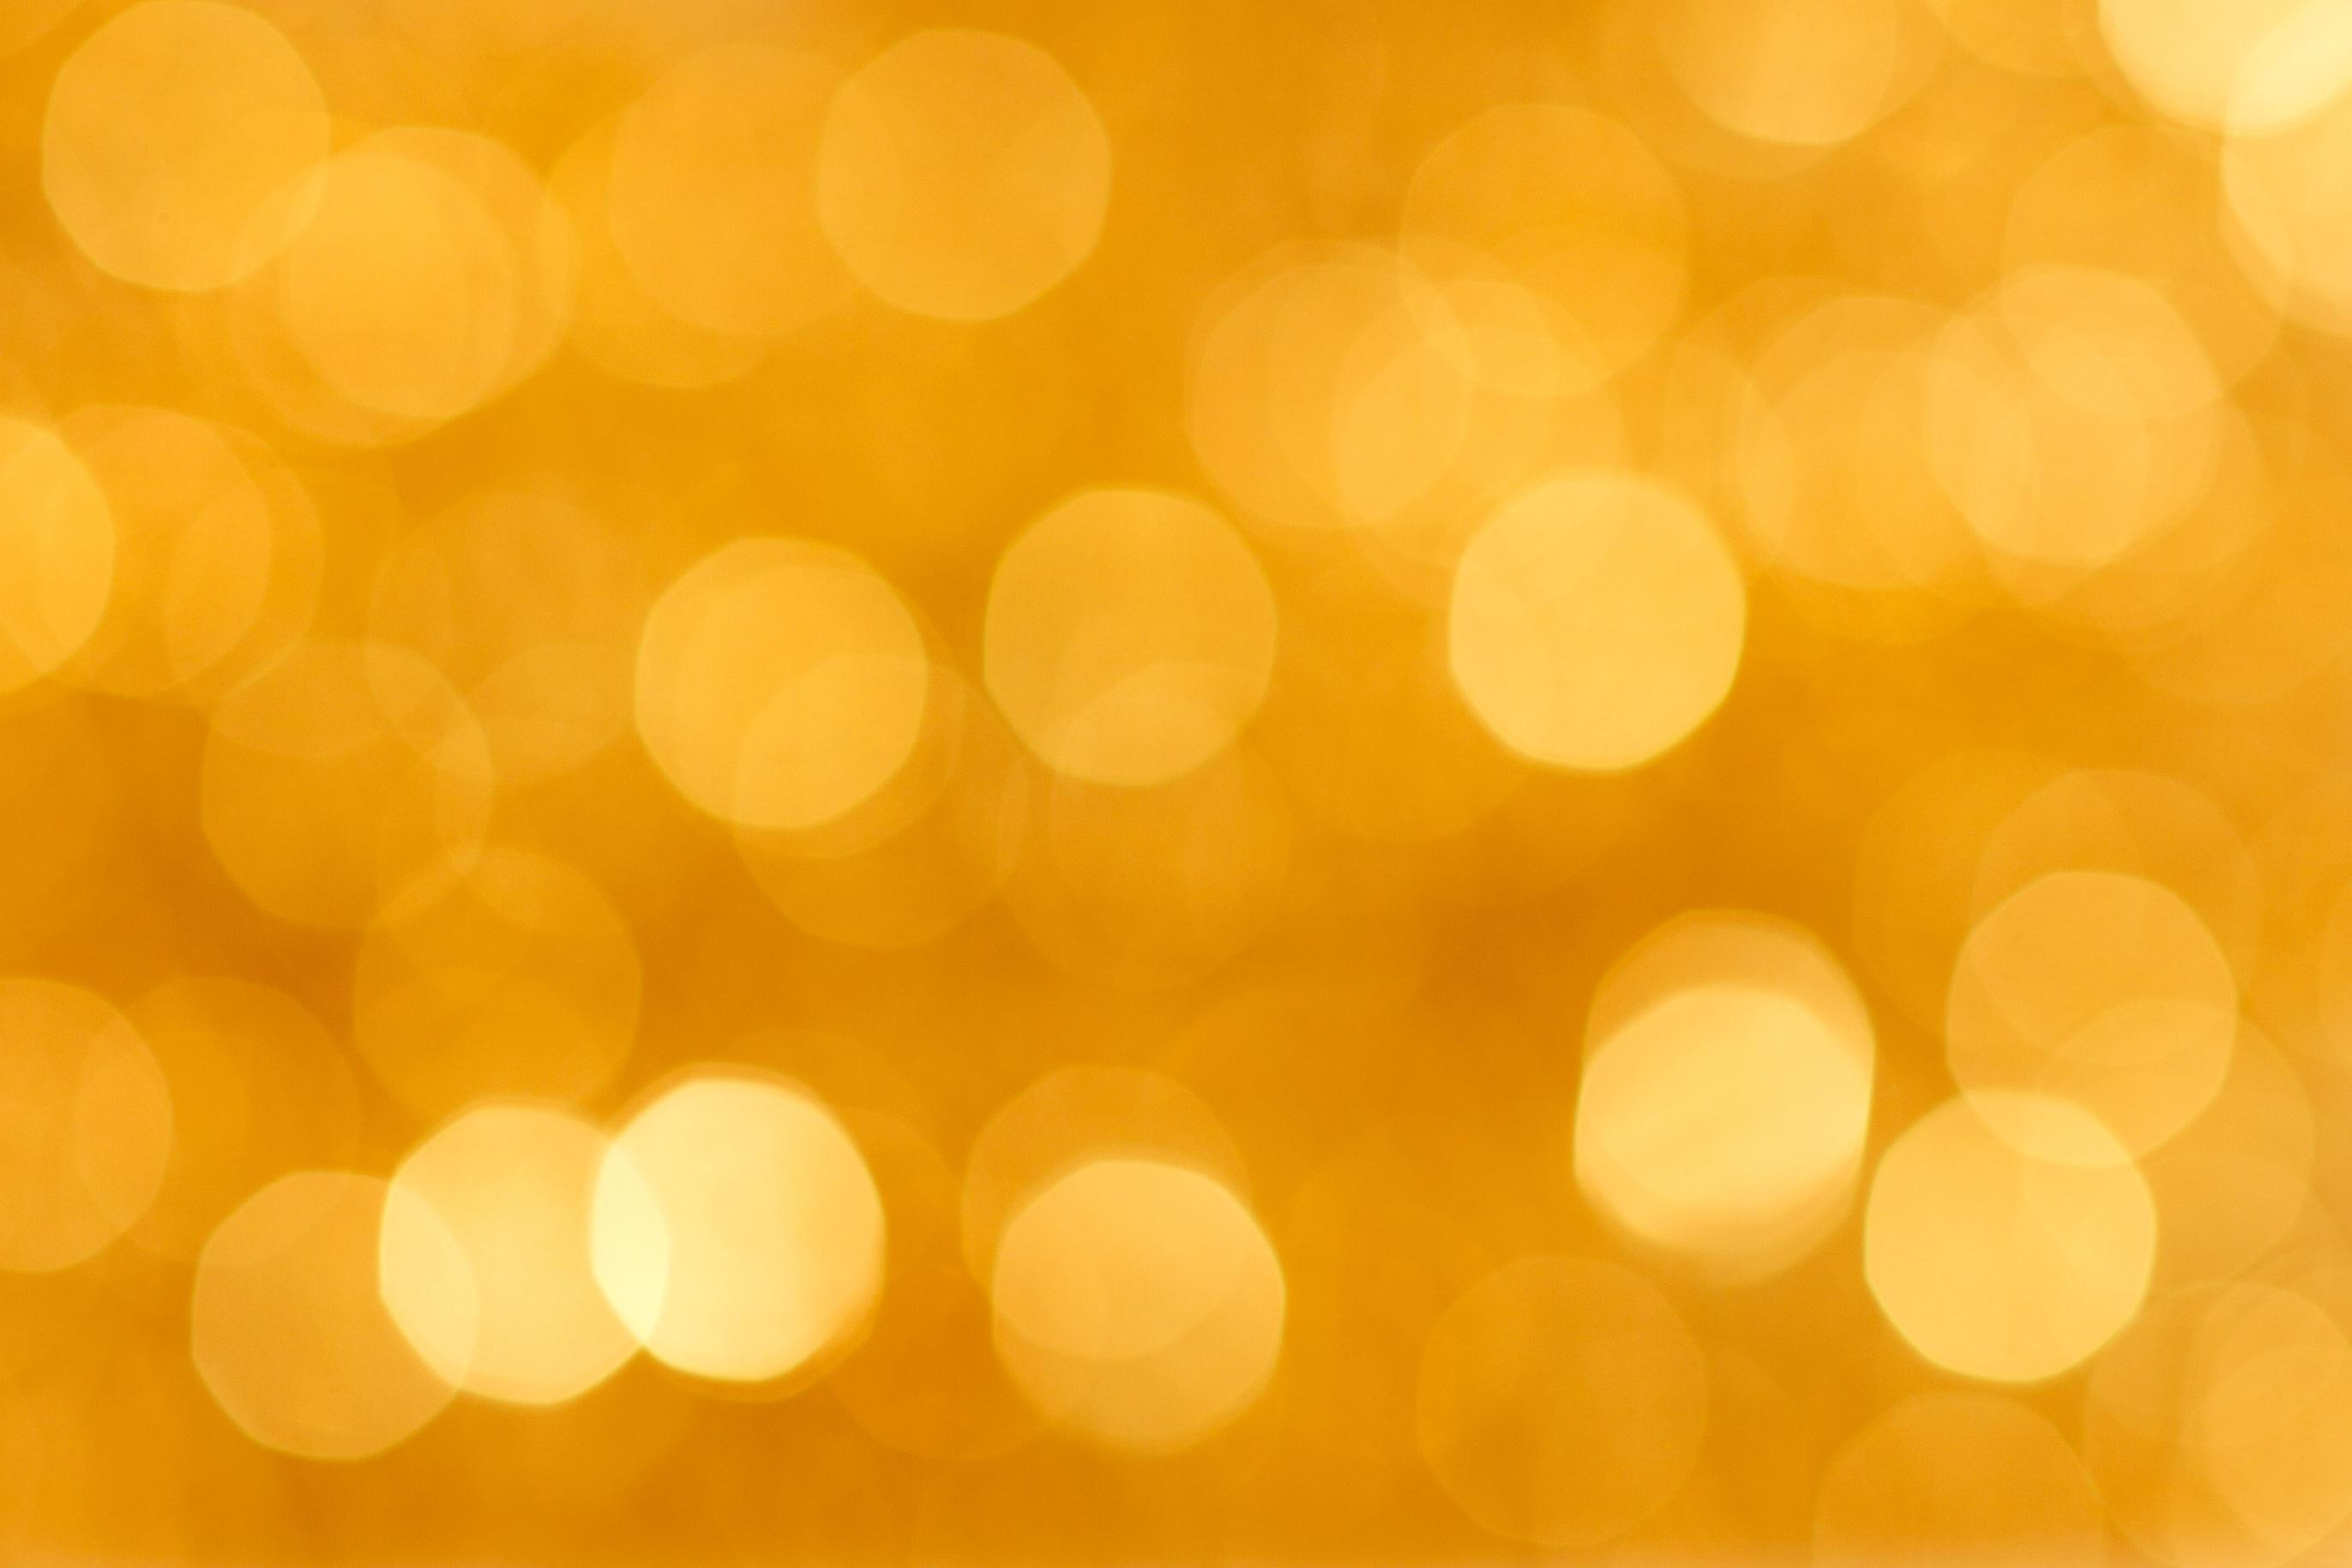 Golden Wallpapers - WallpaperSafari